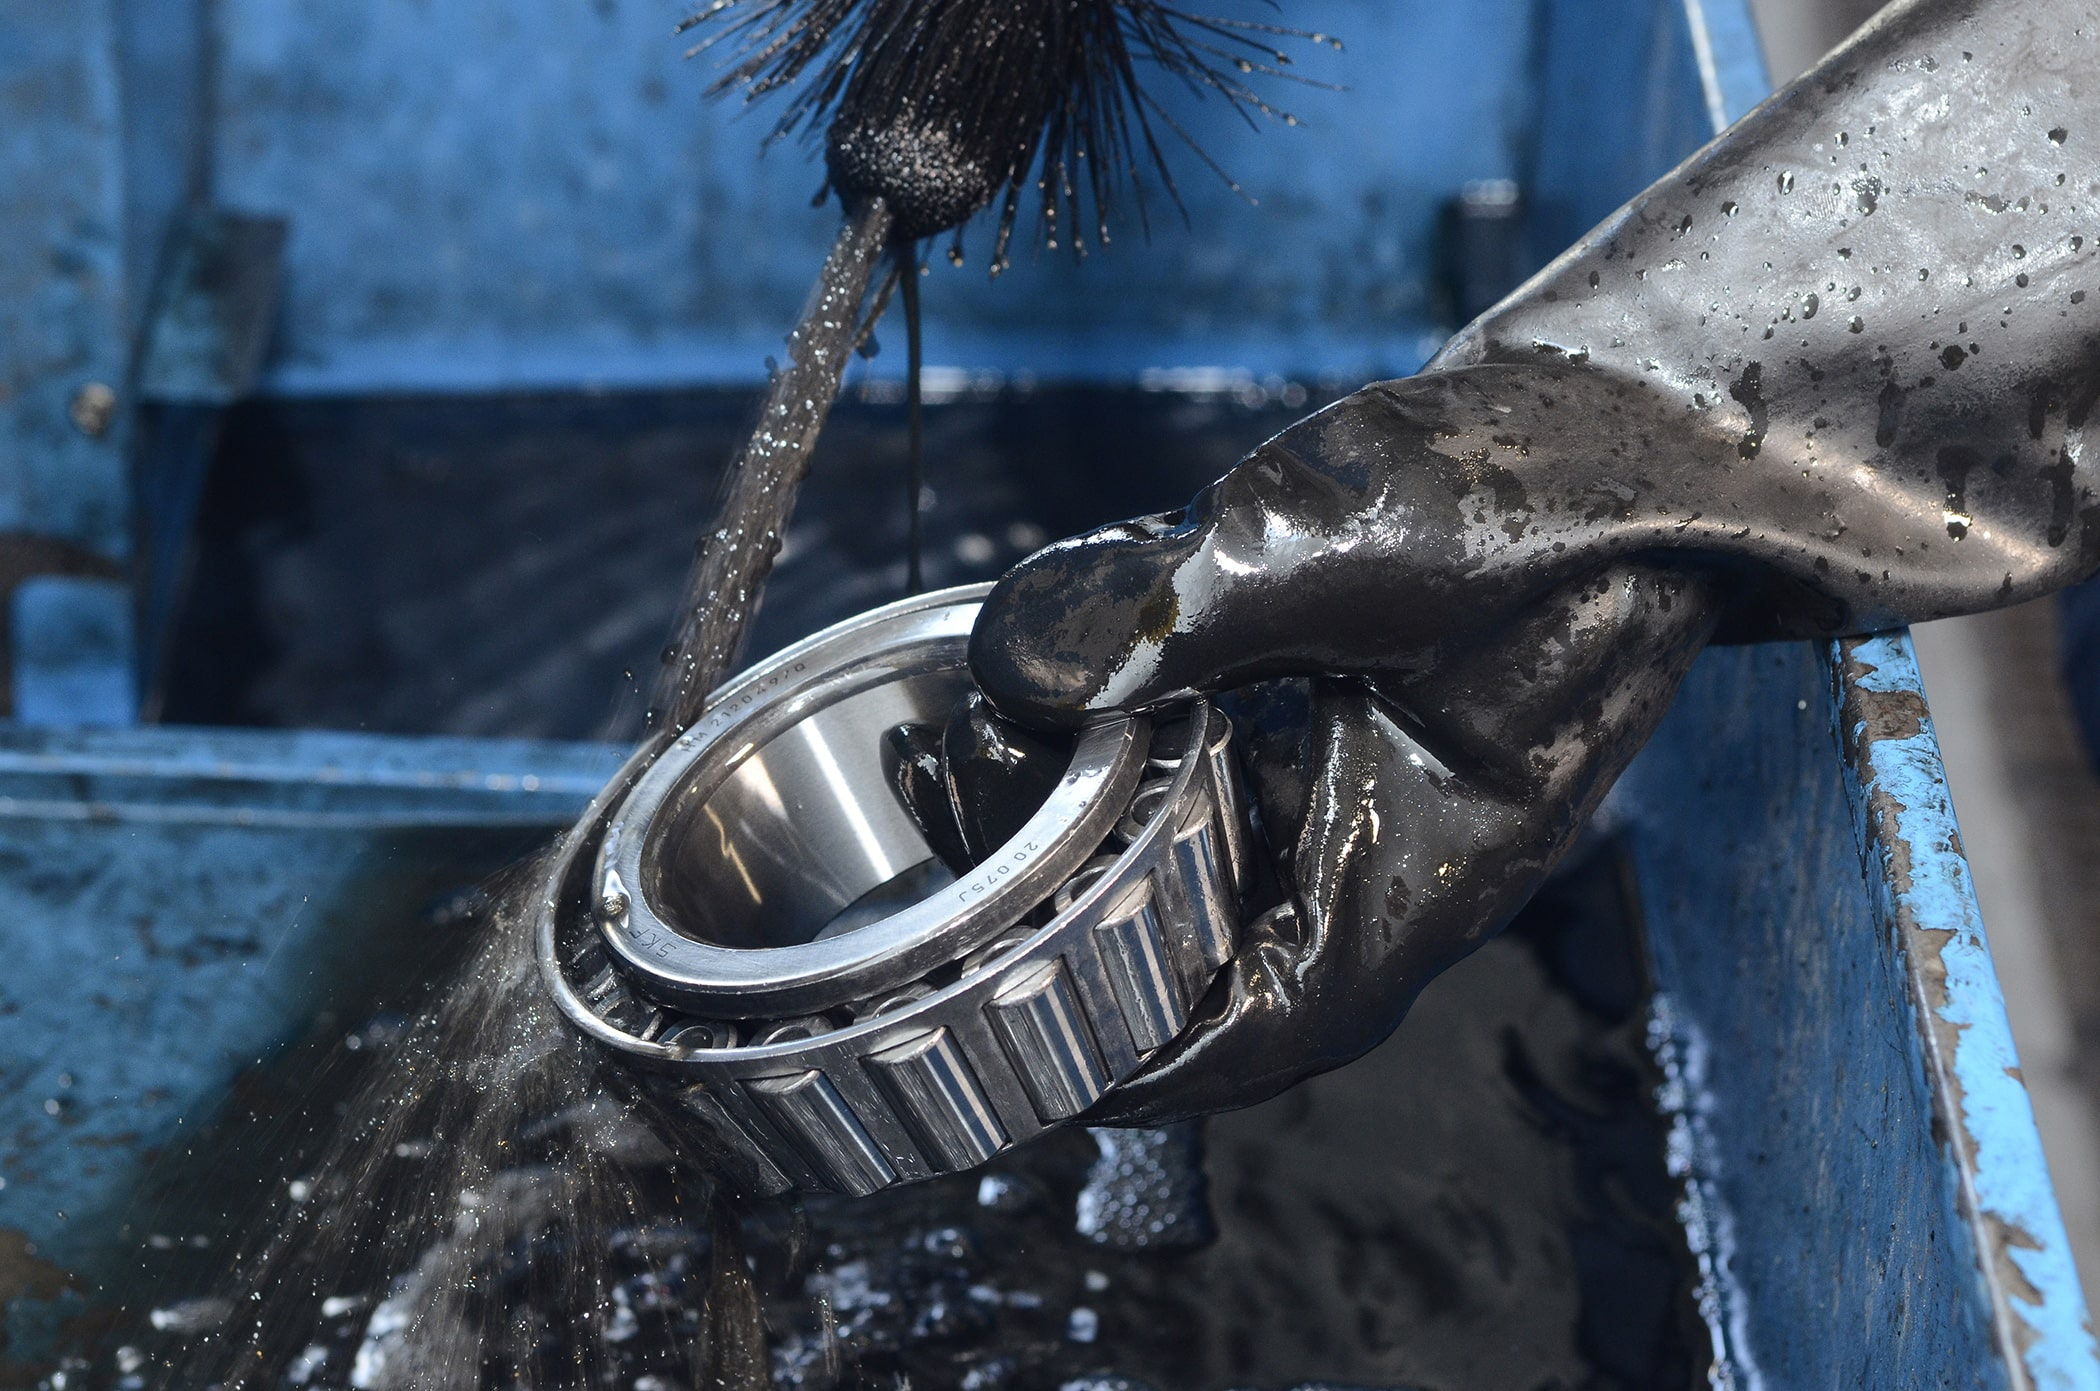 SKF SRT-1 Seal Removal Tool